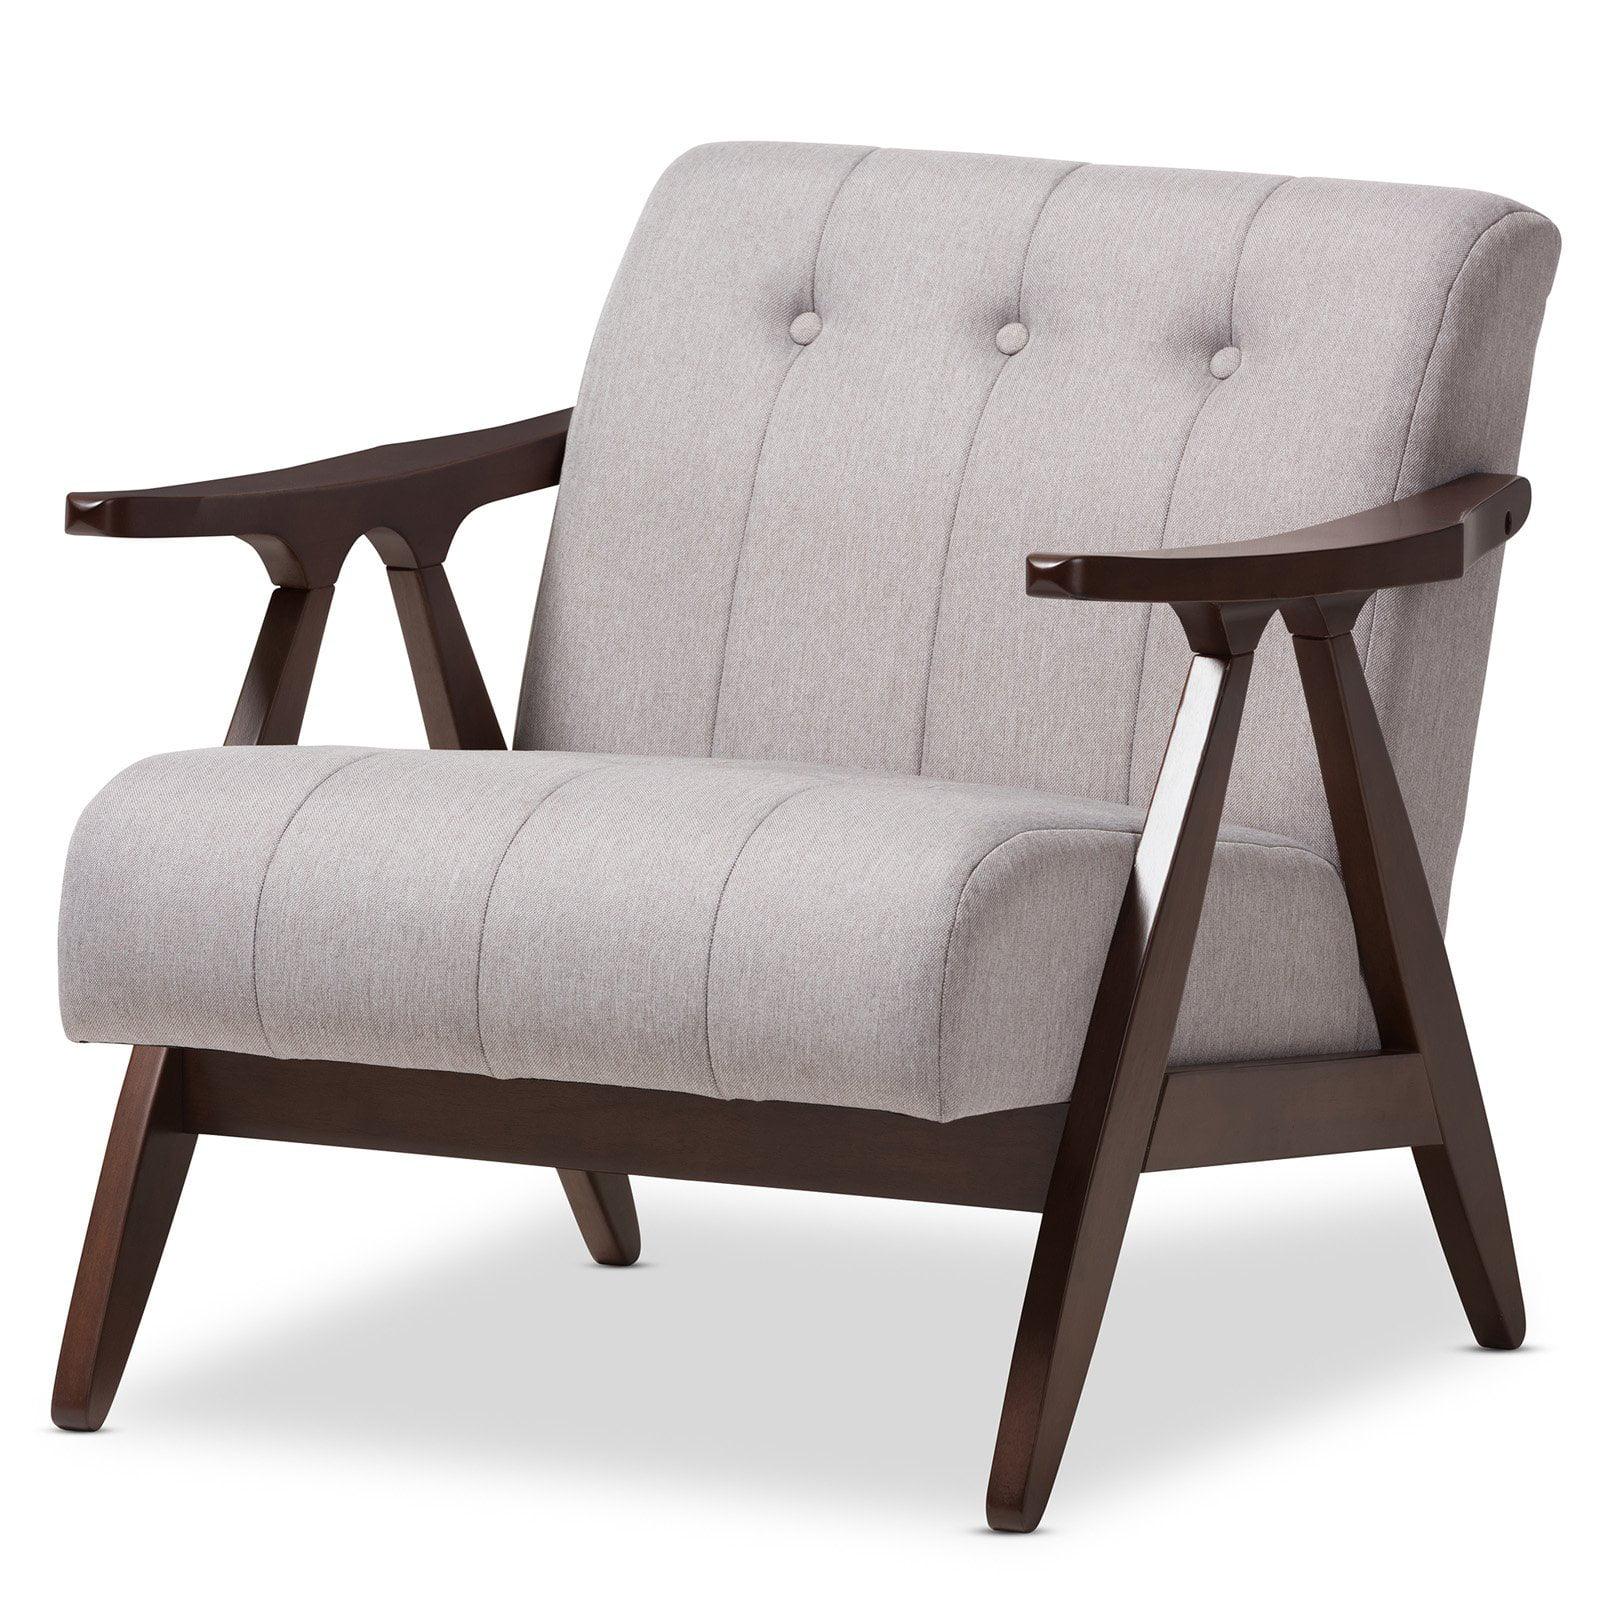 Baxton Studio Enya Grey Fabric Lounge Chair